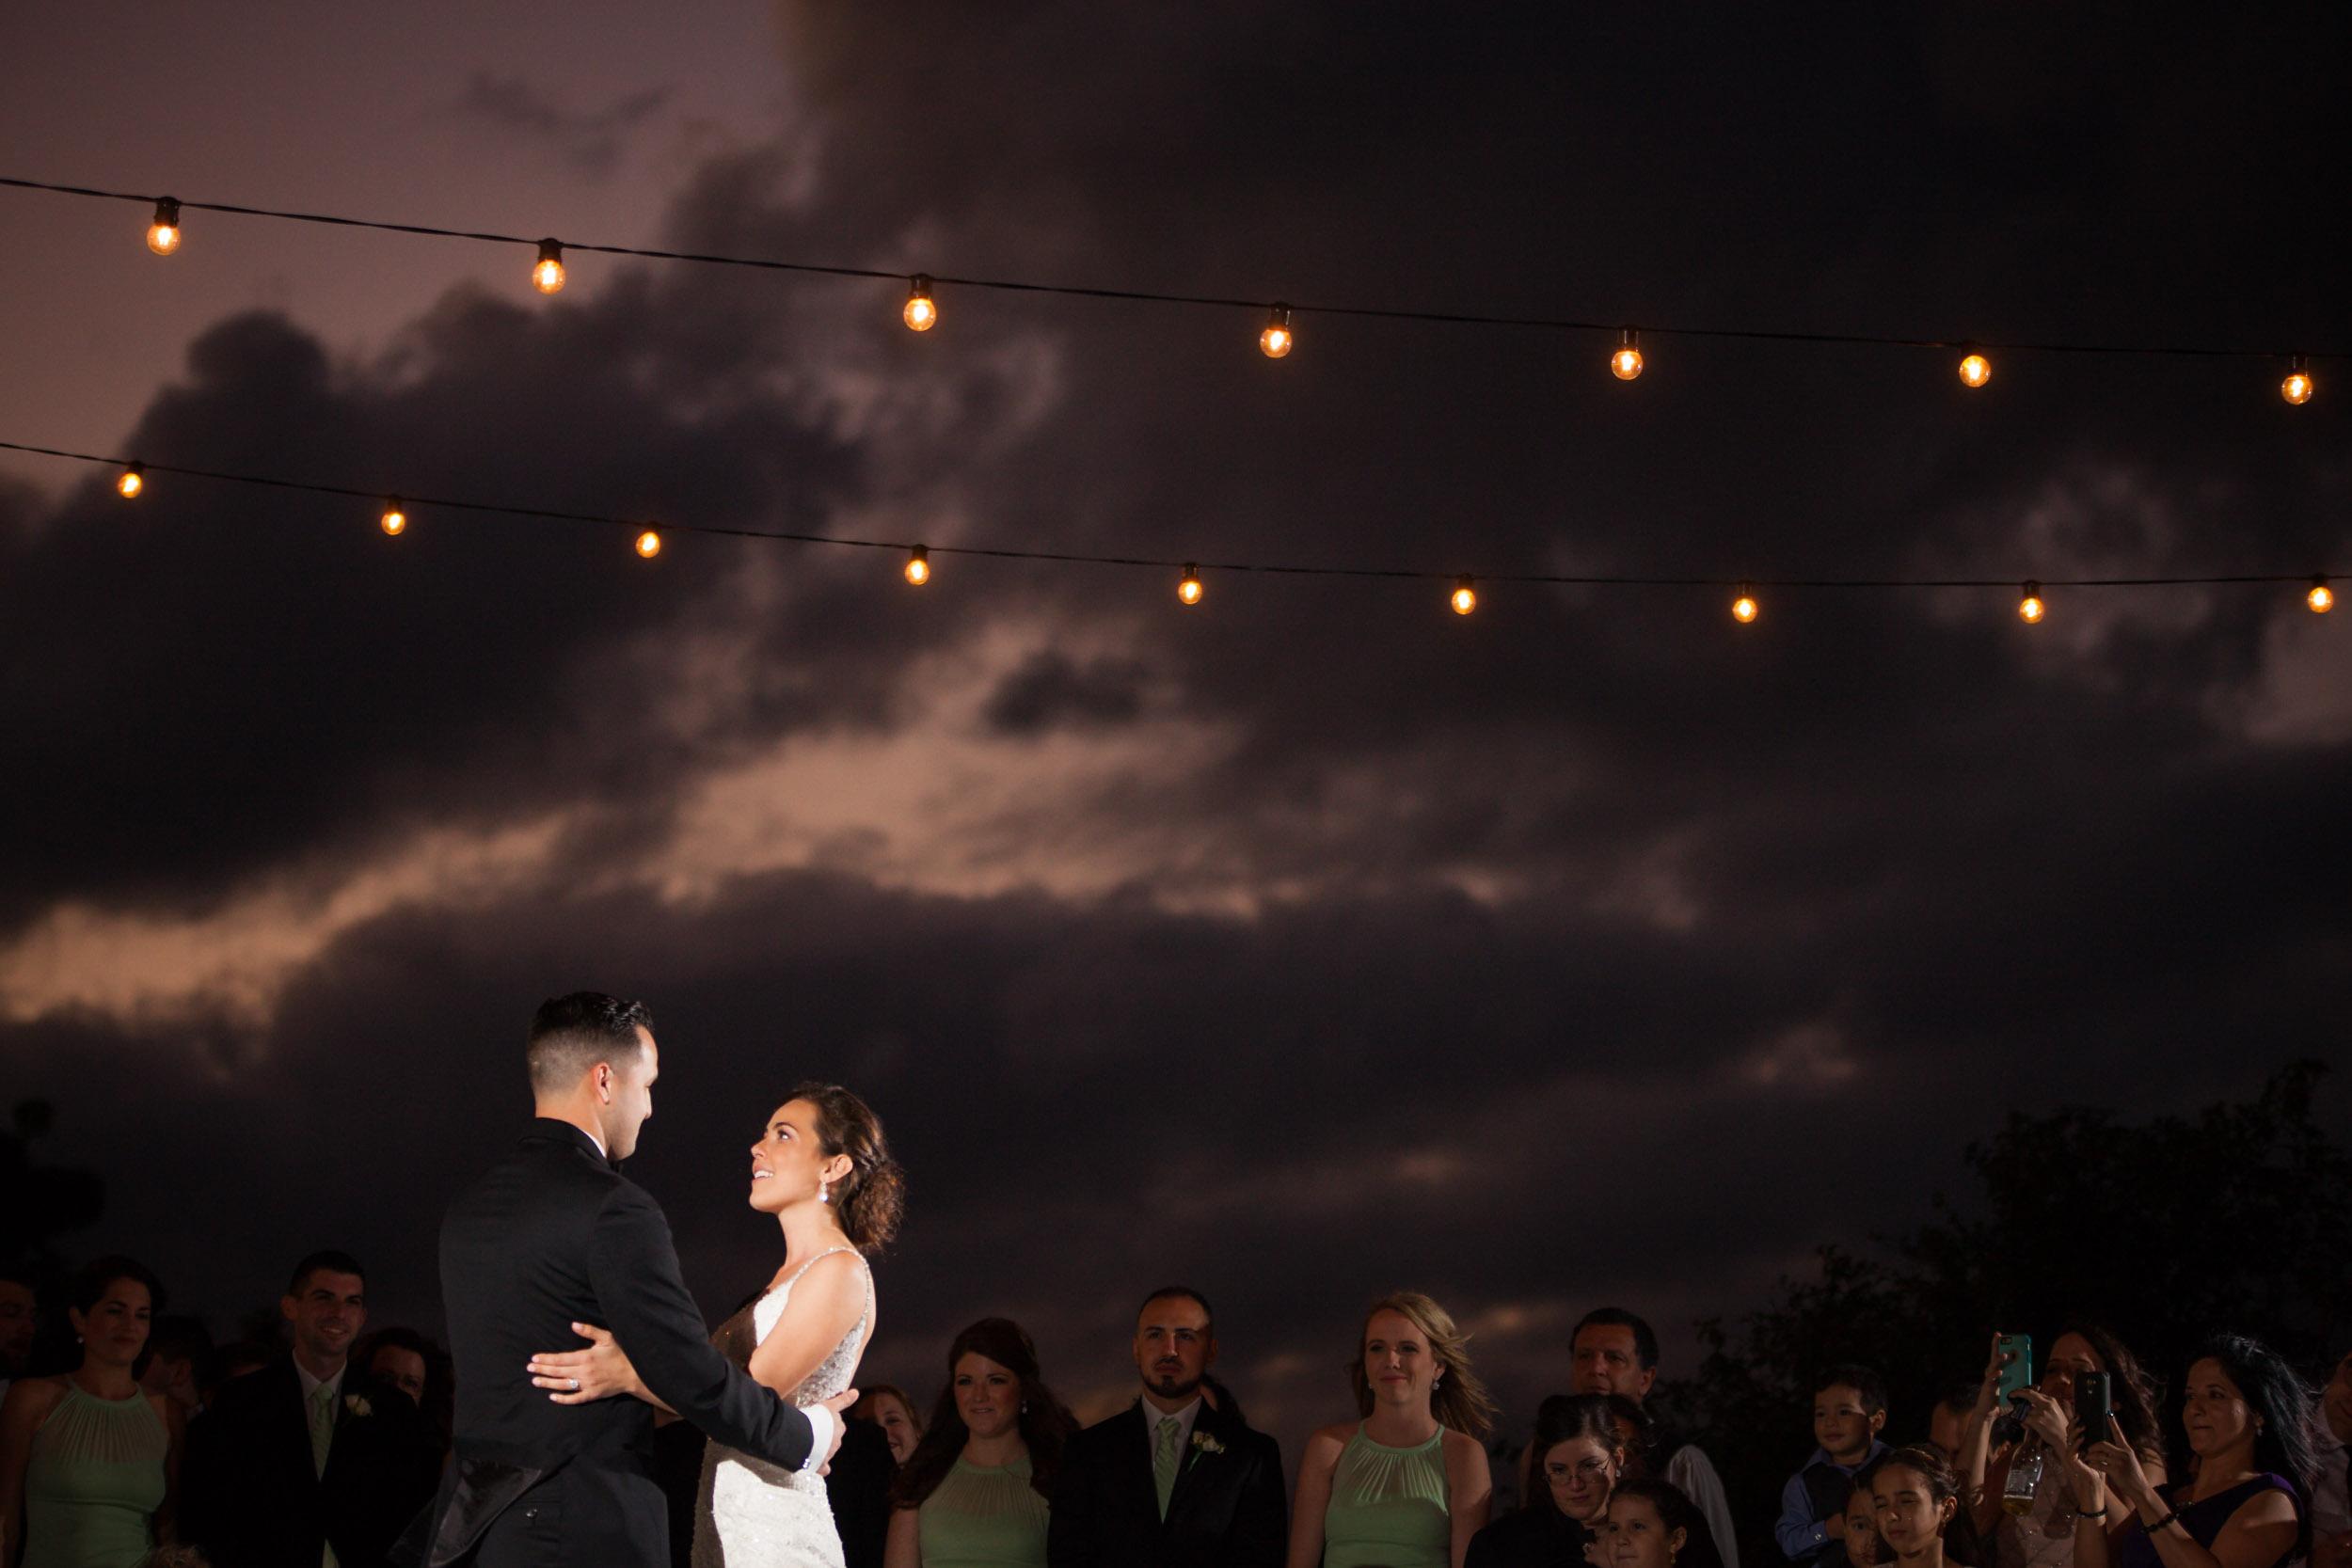 Flordia-Wedding-Photography-58.jpg